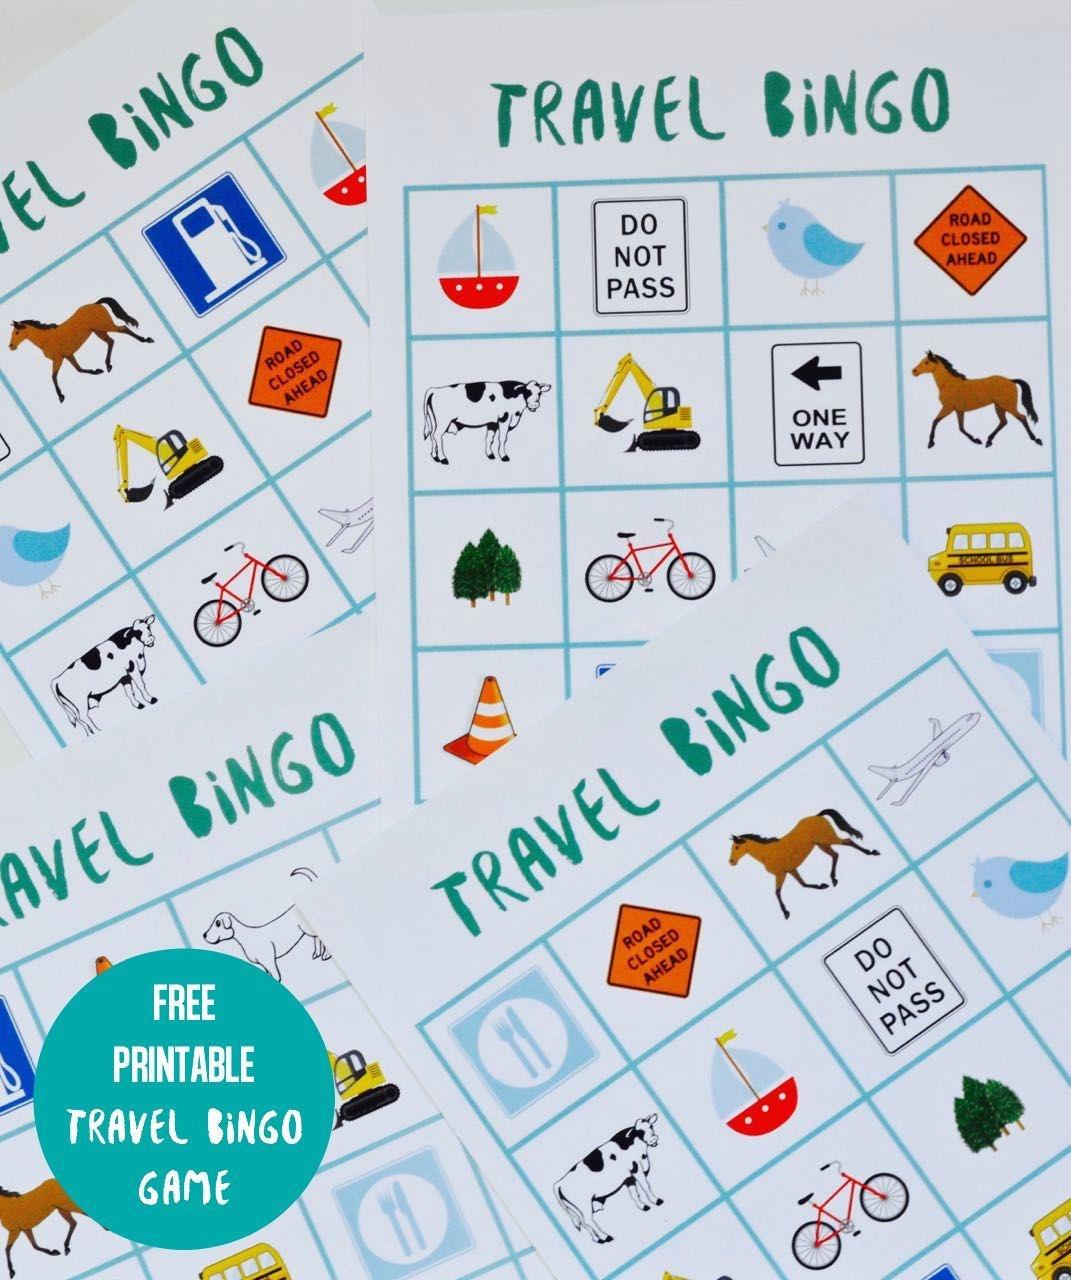 Free Printable Travel Bingo Game | Travel Tips & Ideas | Travel - Free Printable Car Bingo